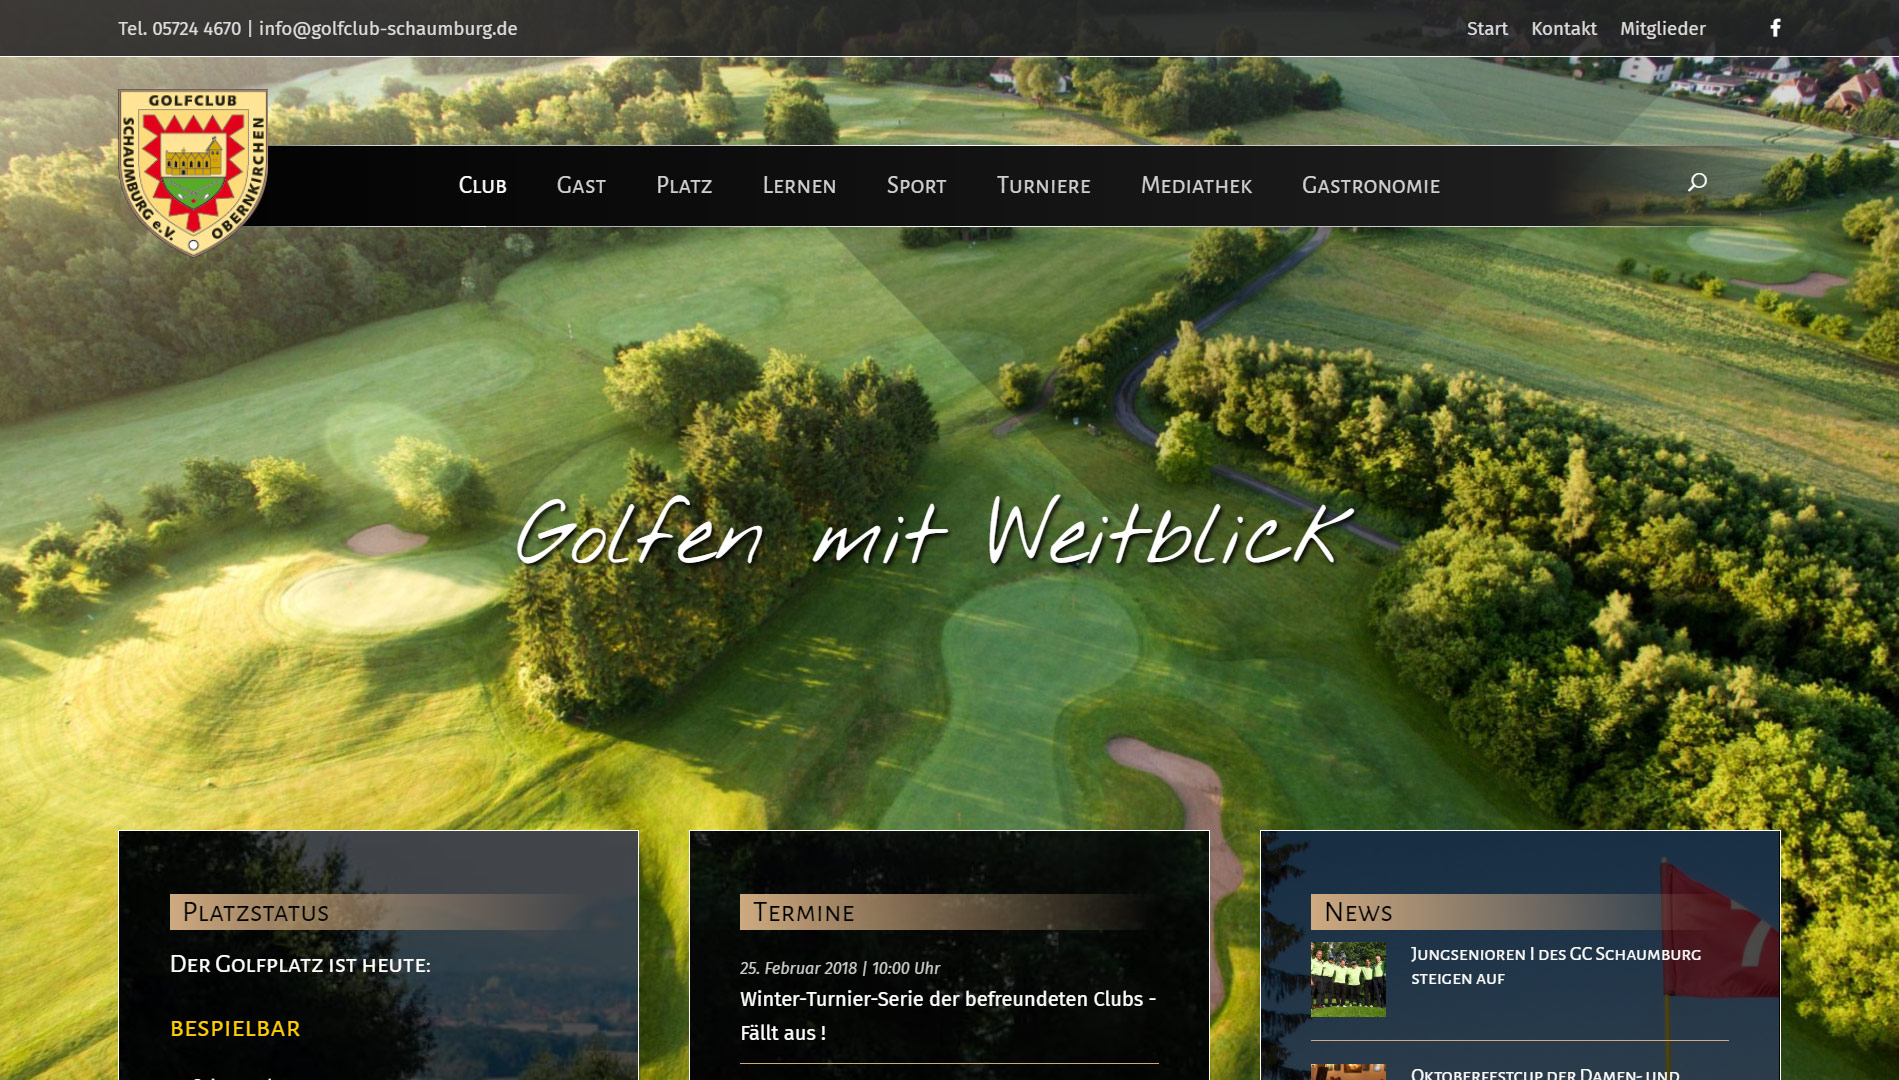 Screenshot Internetseite Golfclub Schaumburg